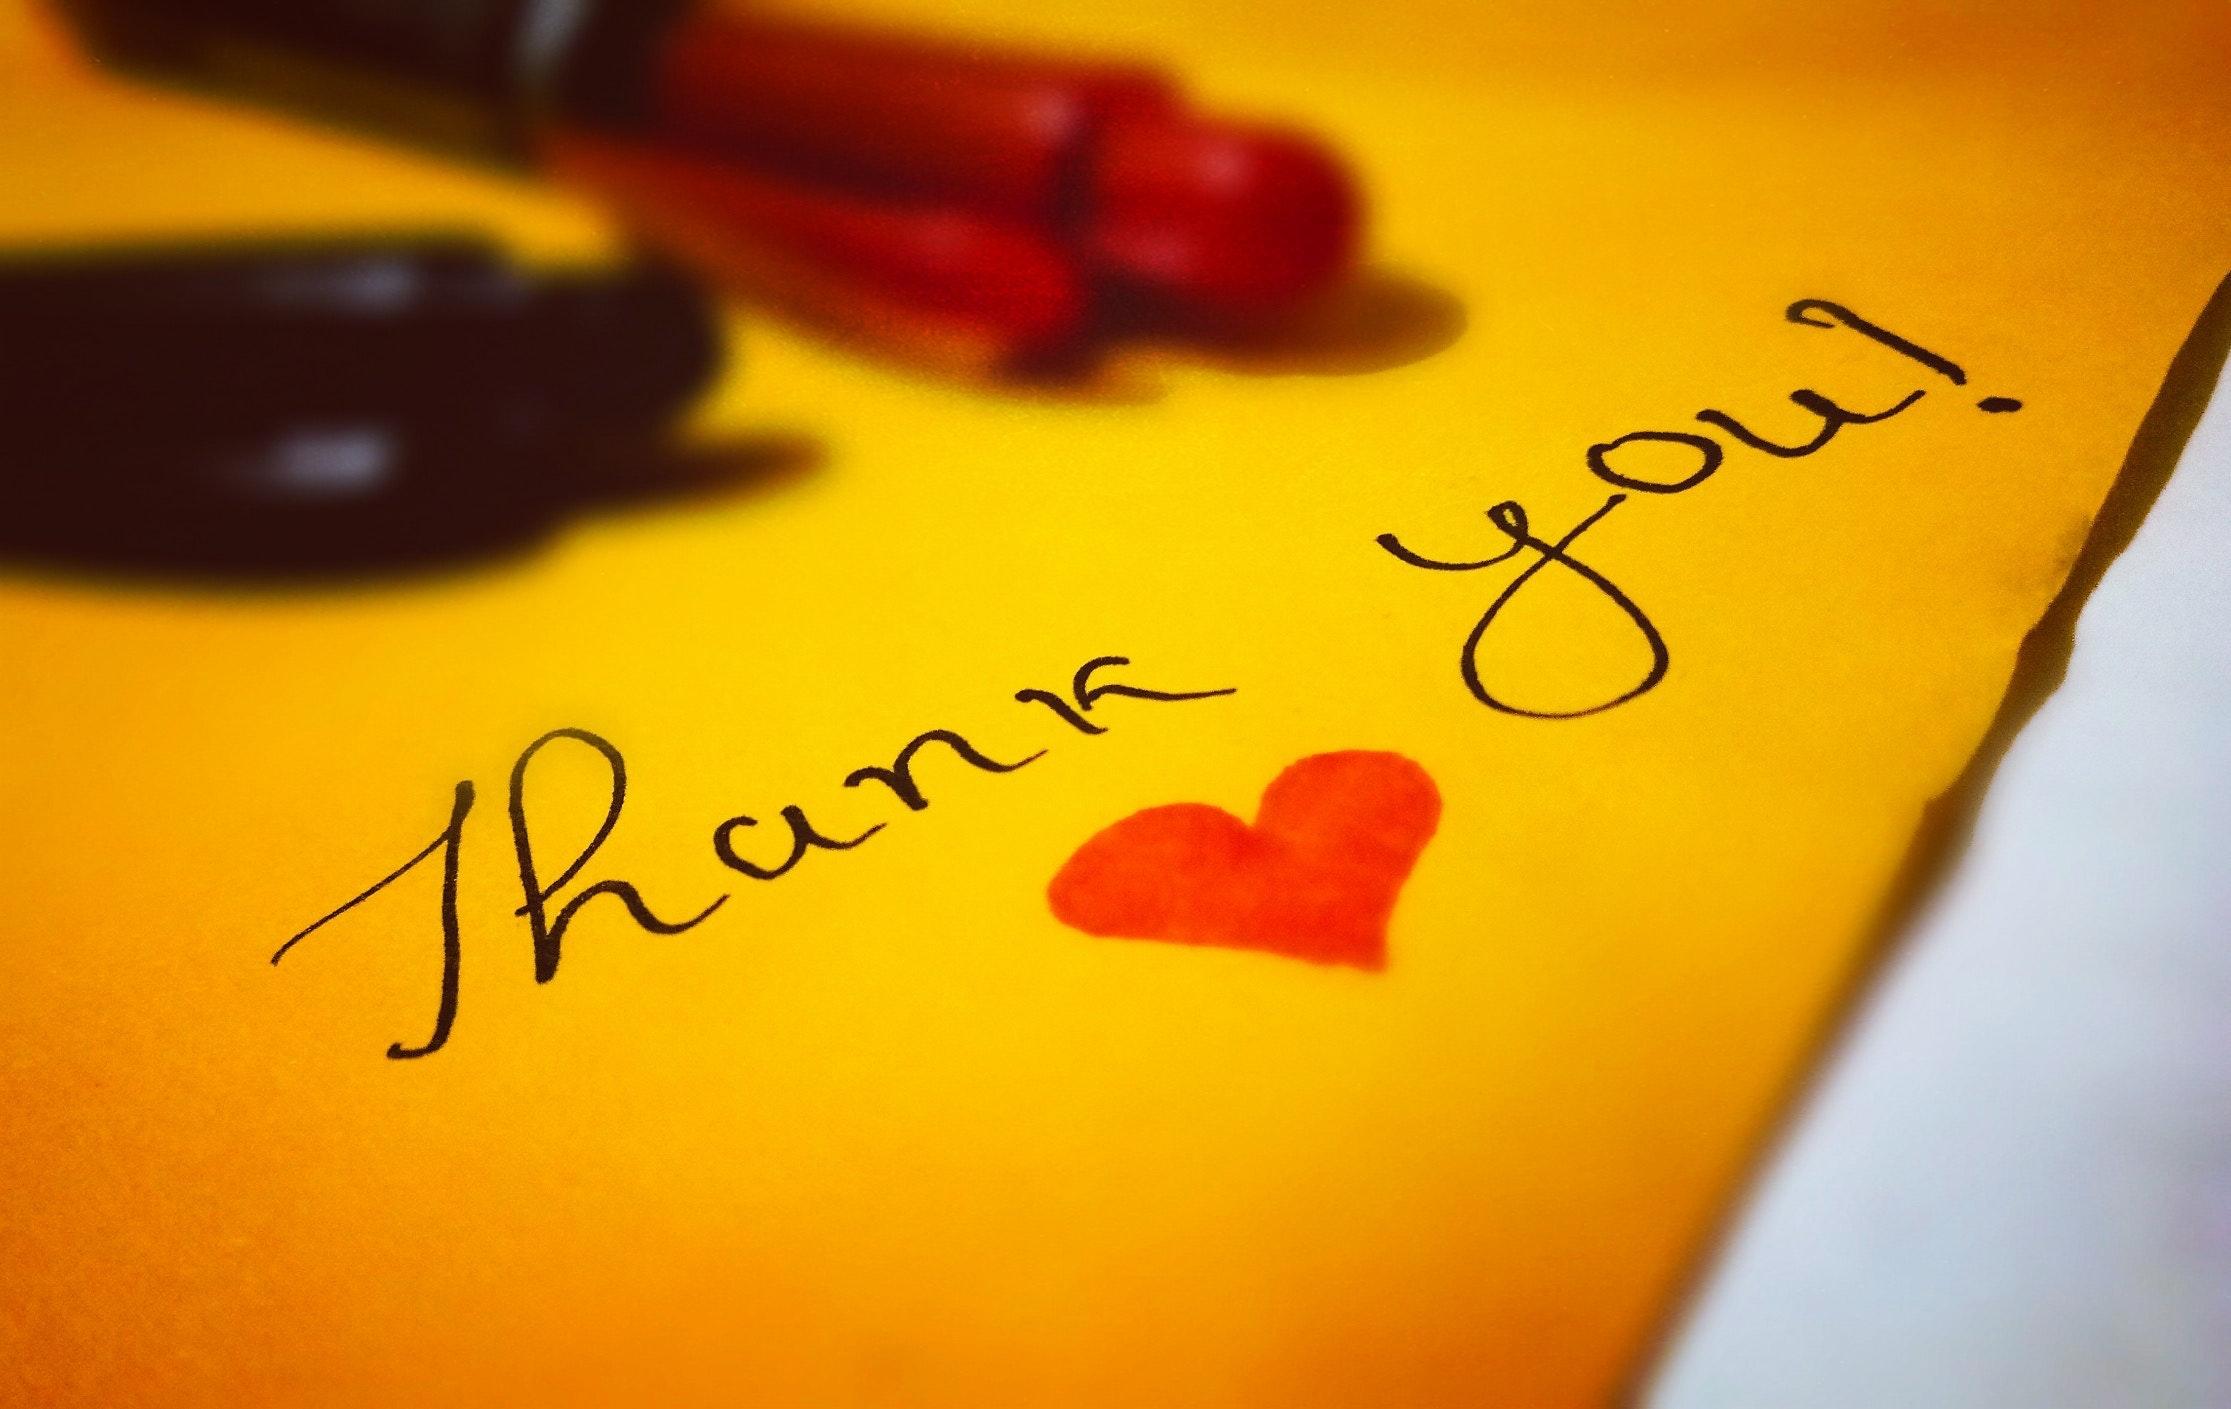 Thank You! Heart Text, Art, Blur, Card, Close-up, HQ Photo